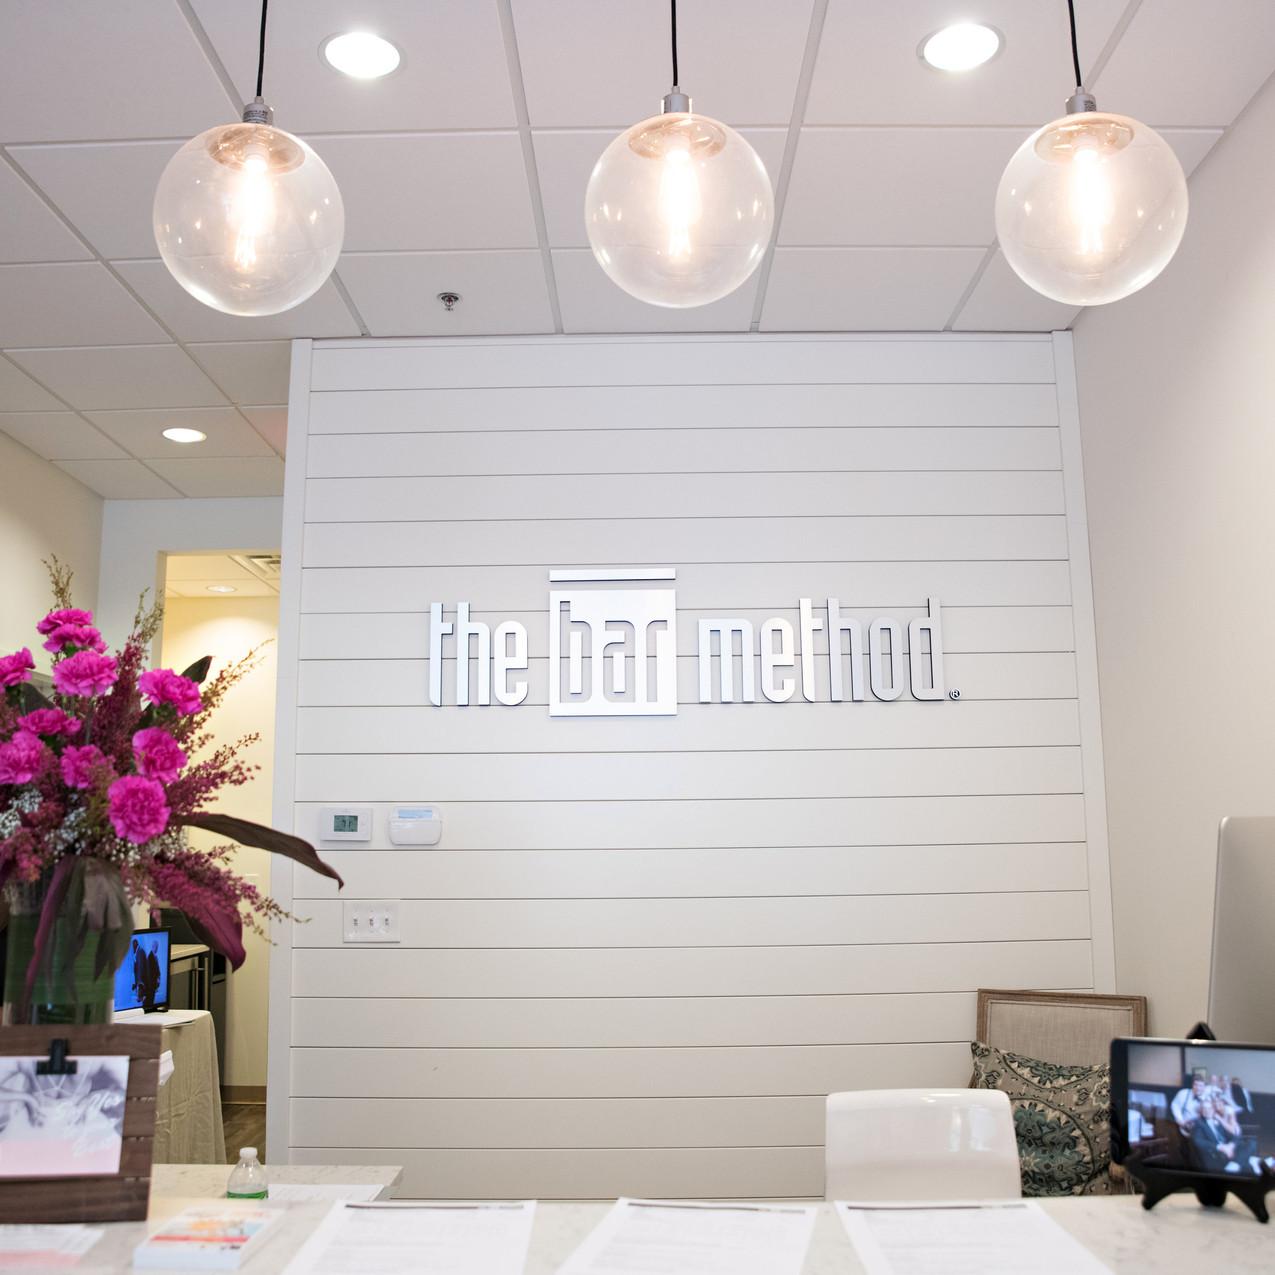 The Bar Method - Buckhead Atlanta